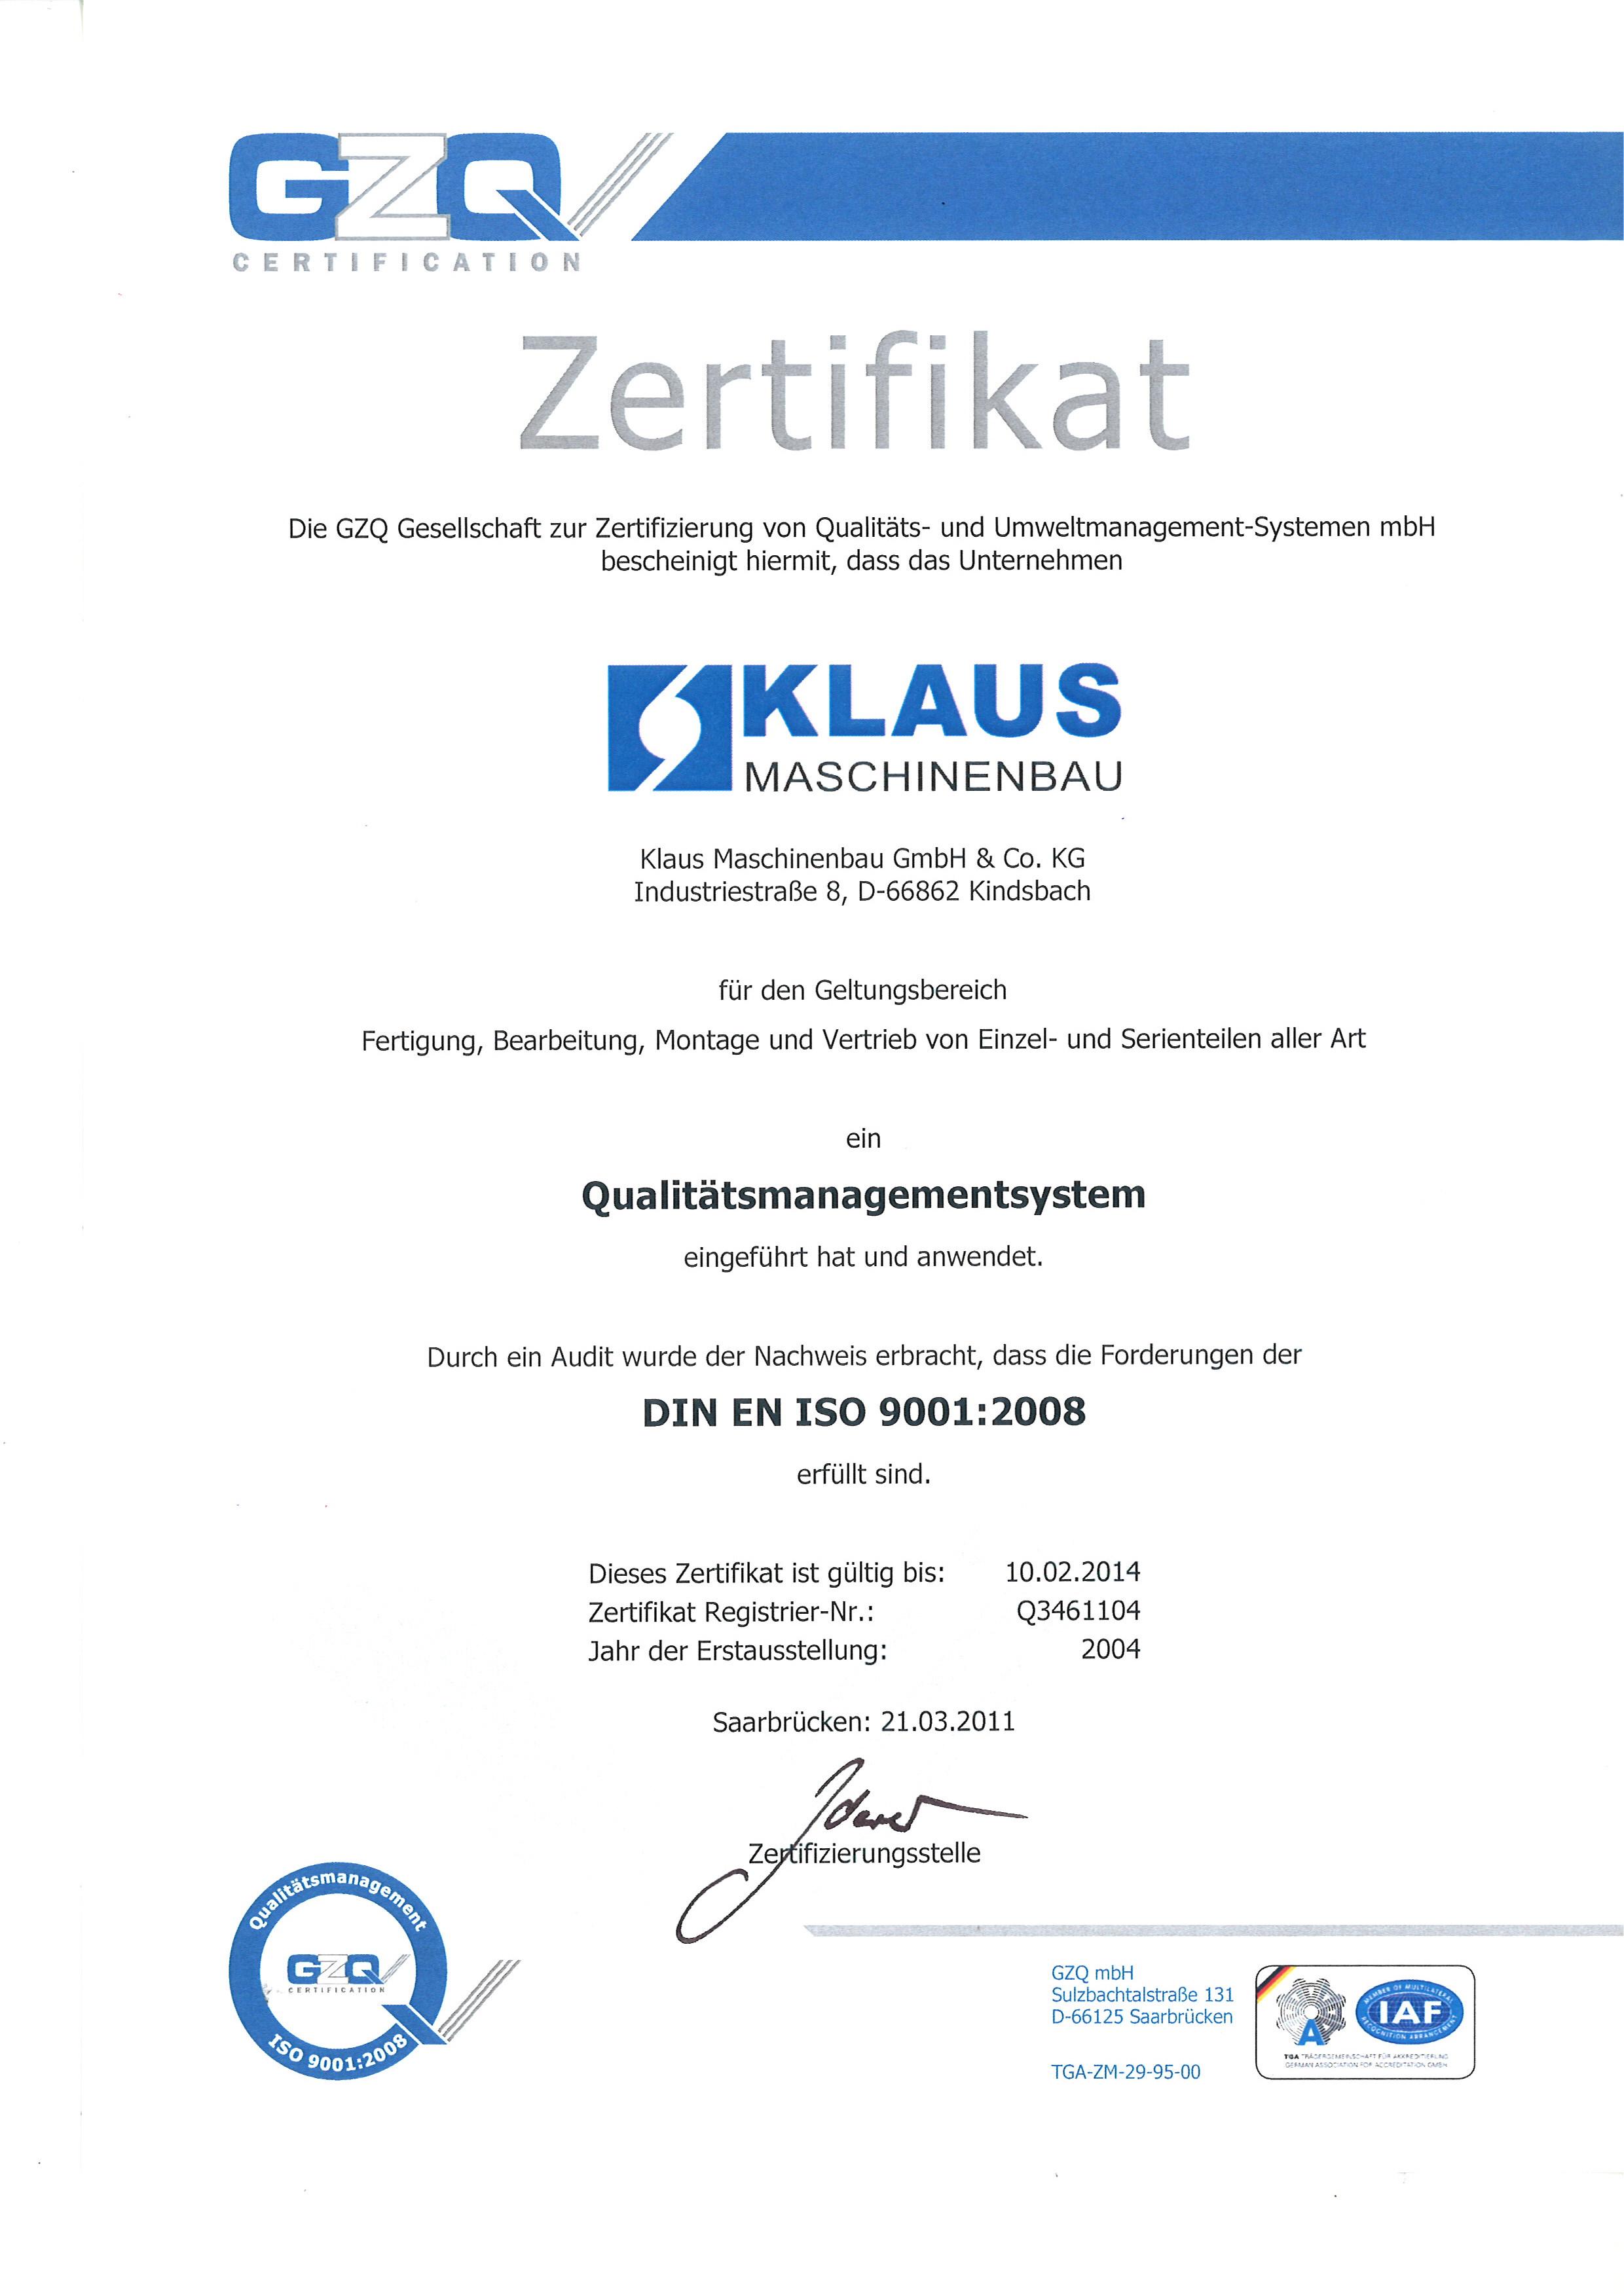 Zertifikat DIN ISO 9001:2008 gültig bis 2013